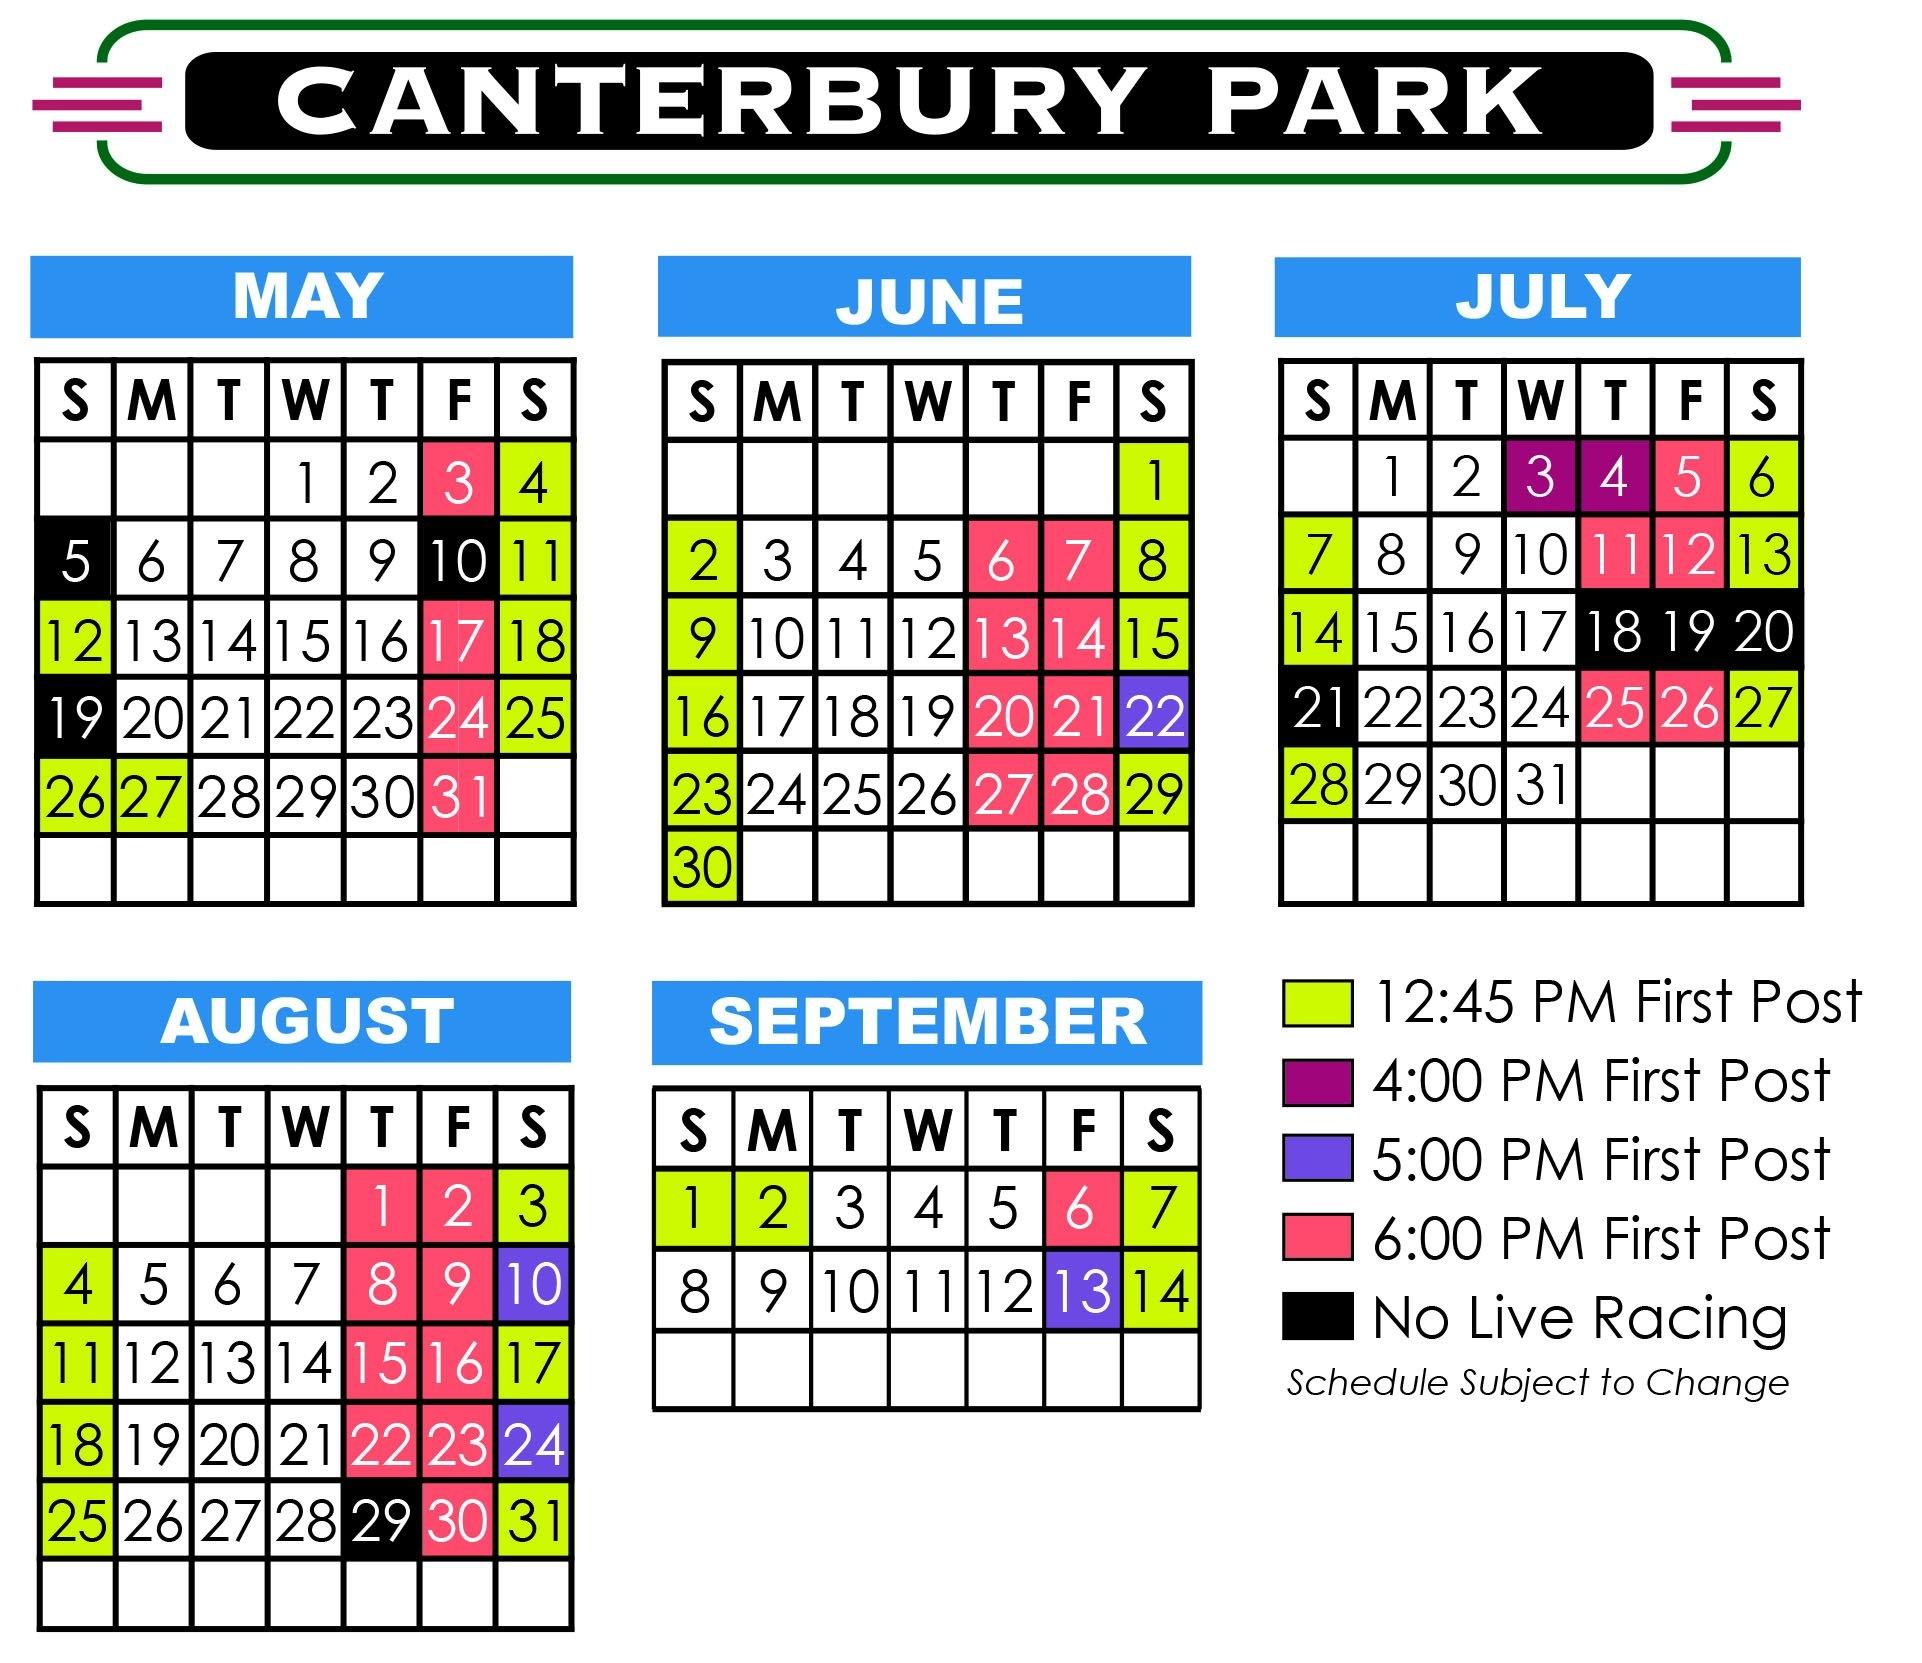 2019 Live Racing Season | Promotions | Canterbury Park 445 Calendar 2019